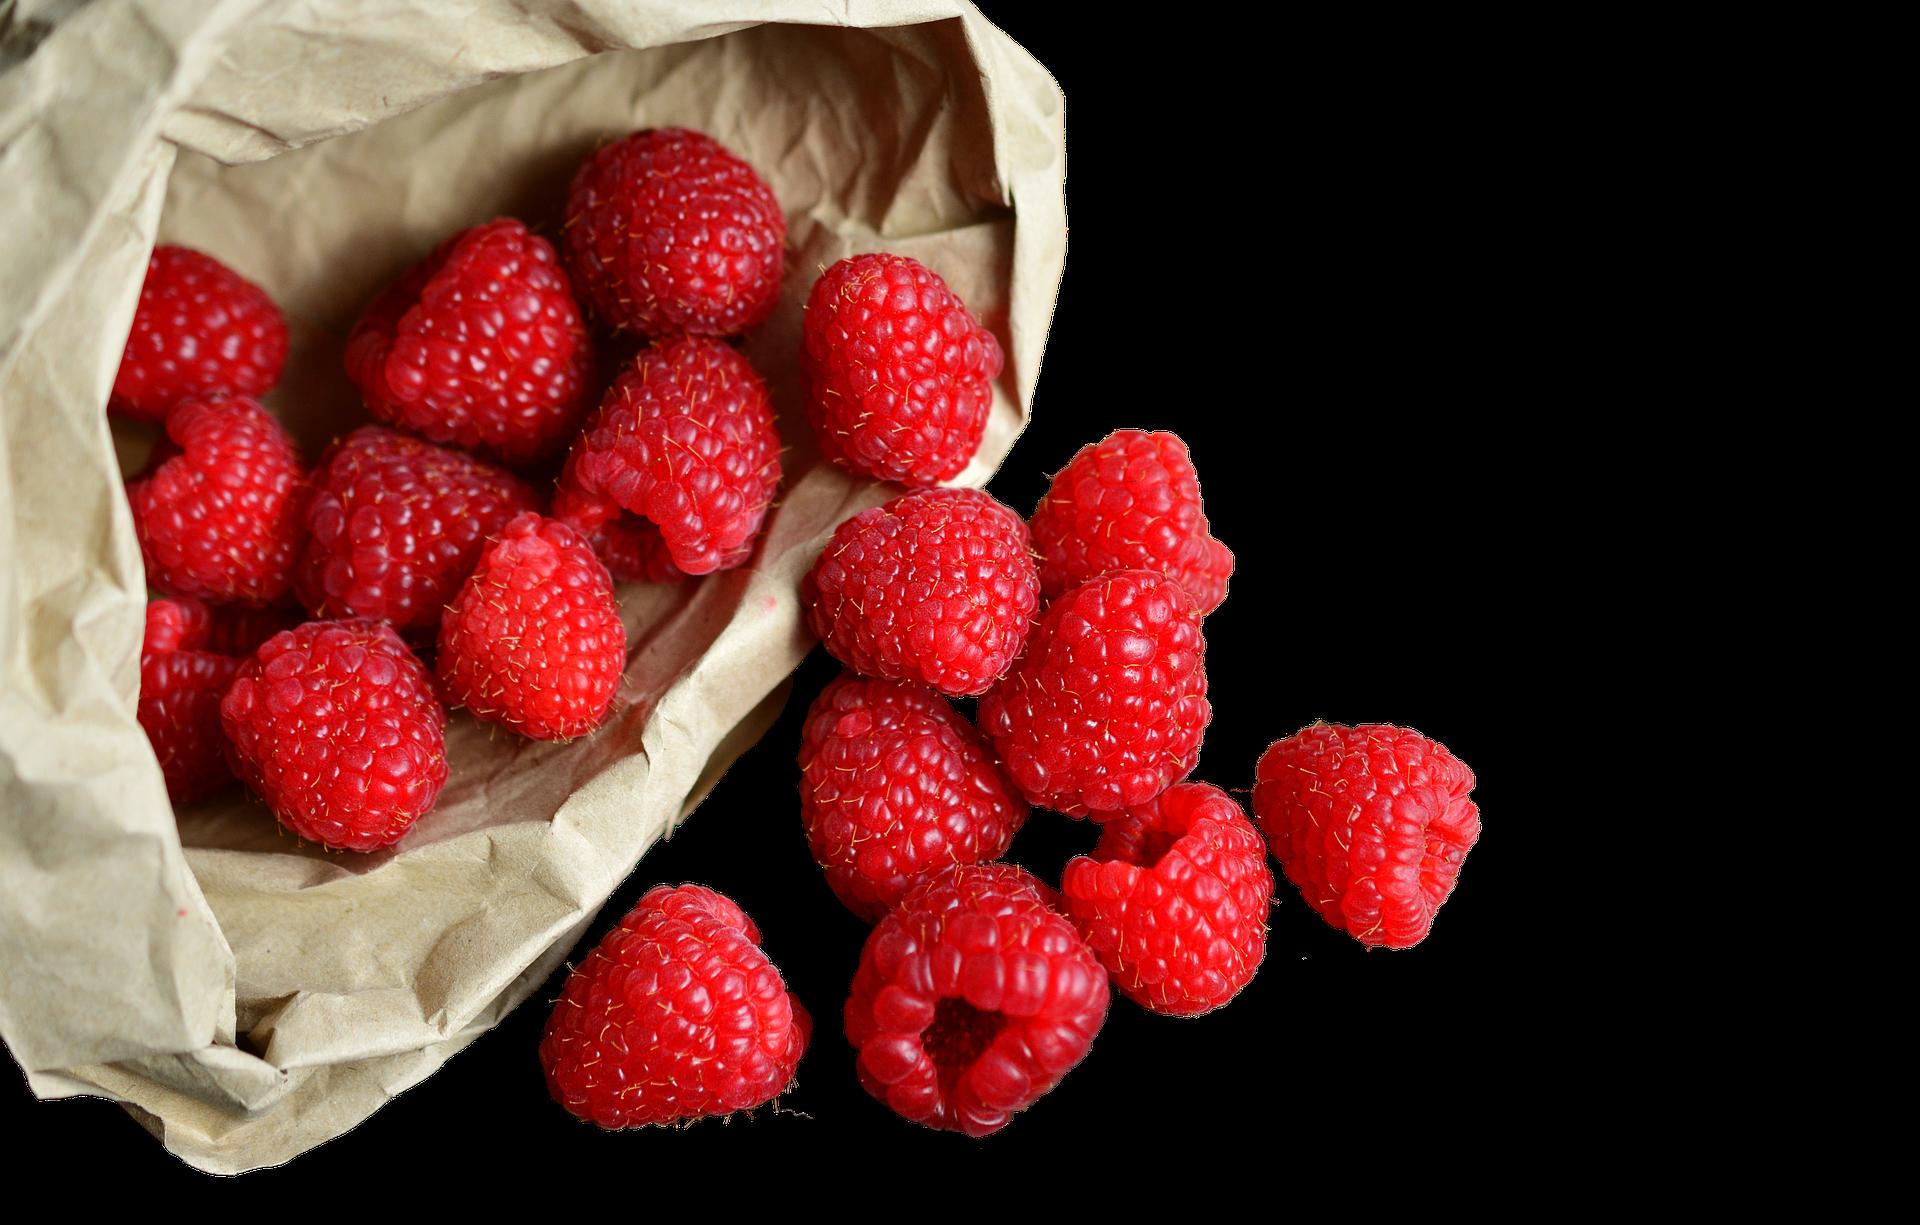 raspberries-in-the-bag-3730318_1920